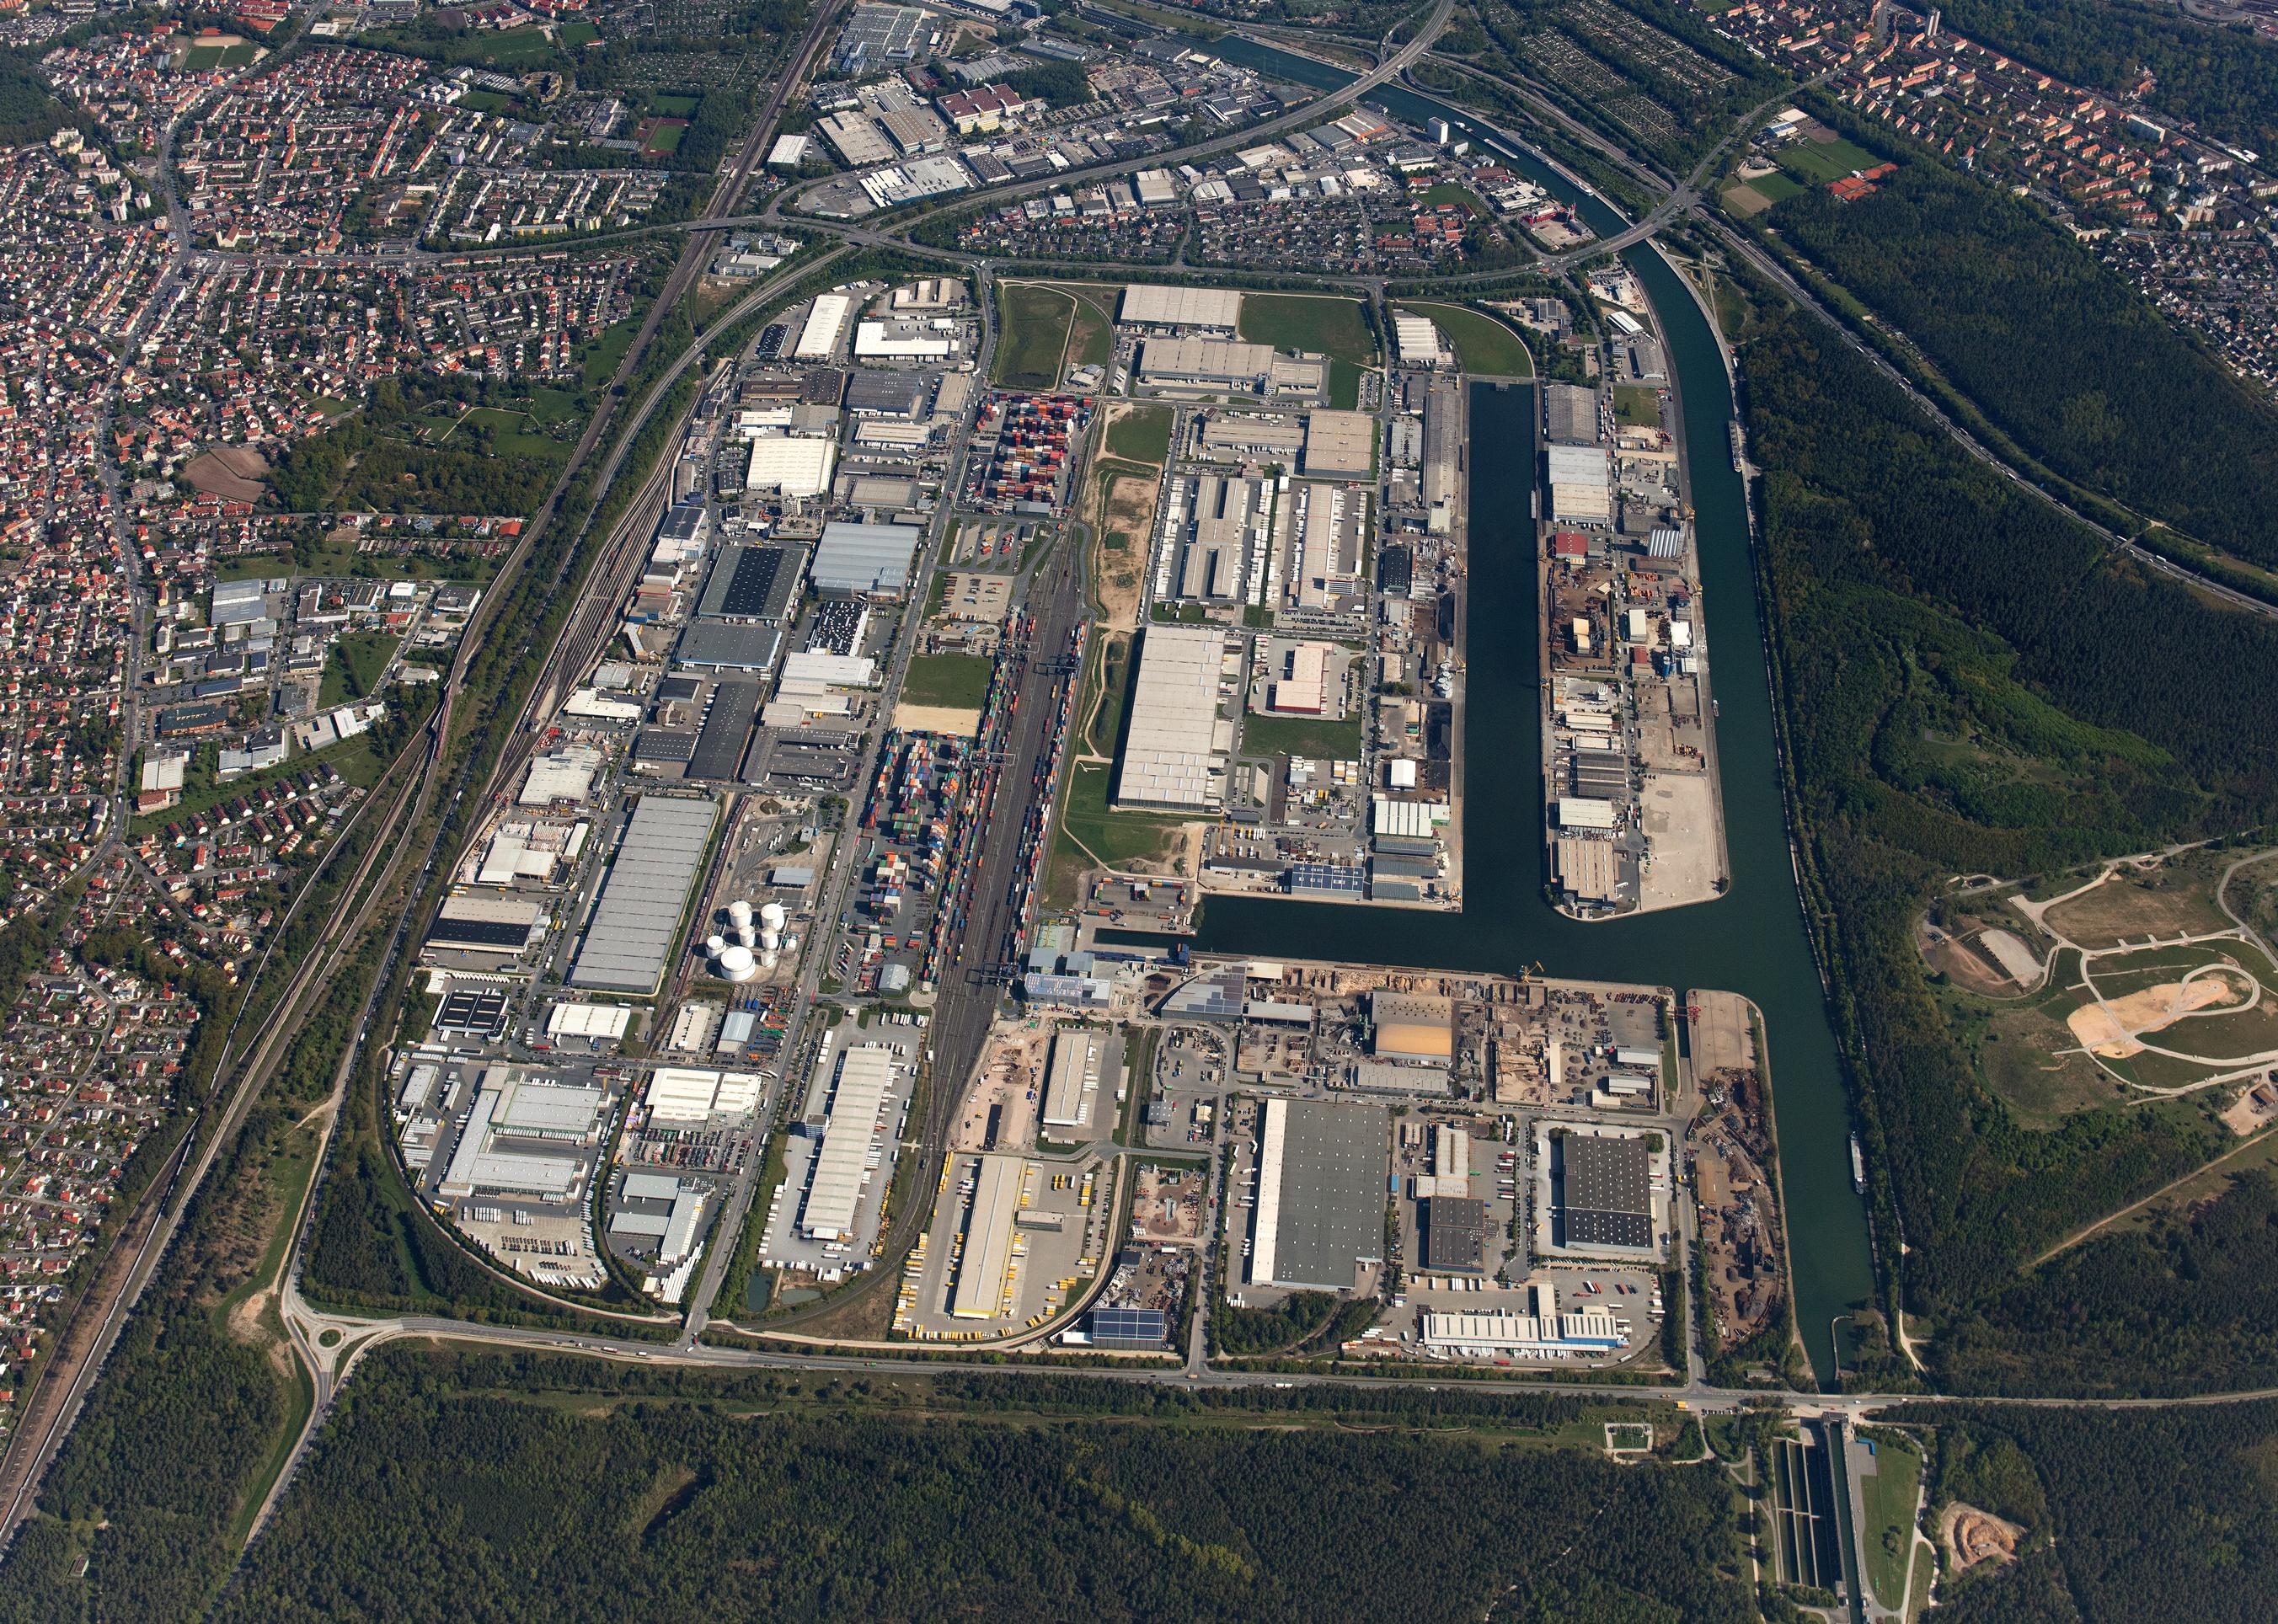 Luftbild bayernhafen Nürnberg